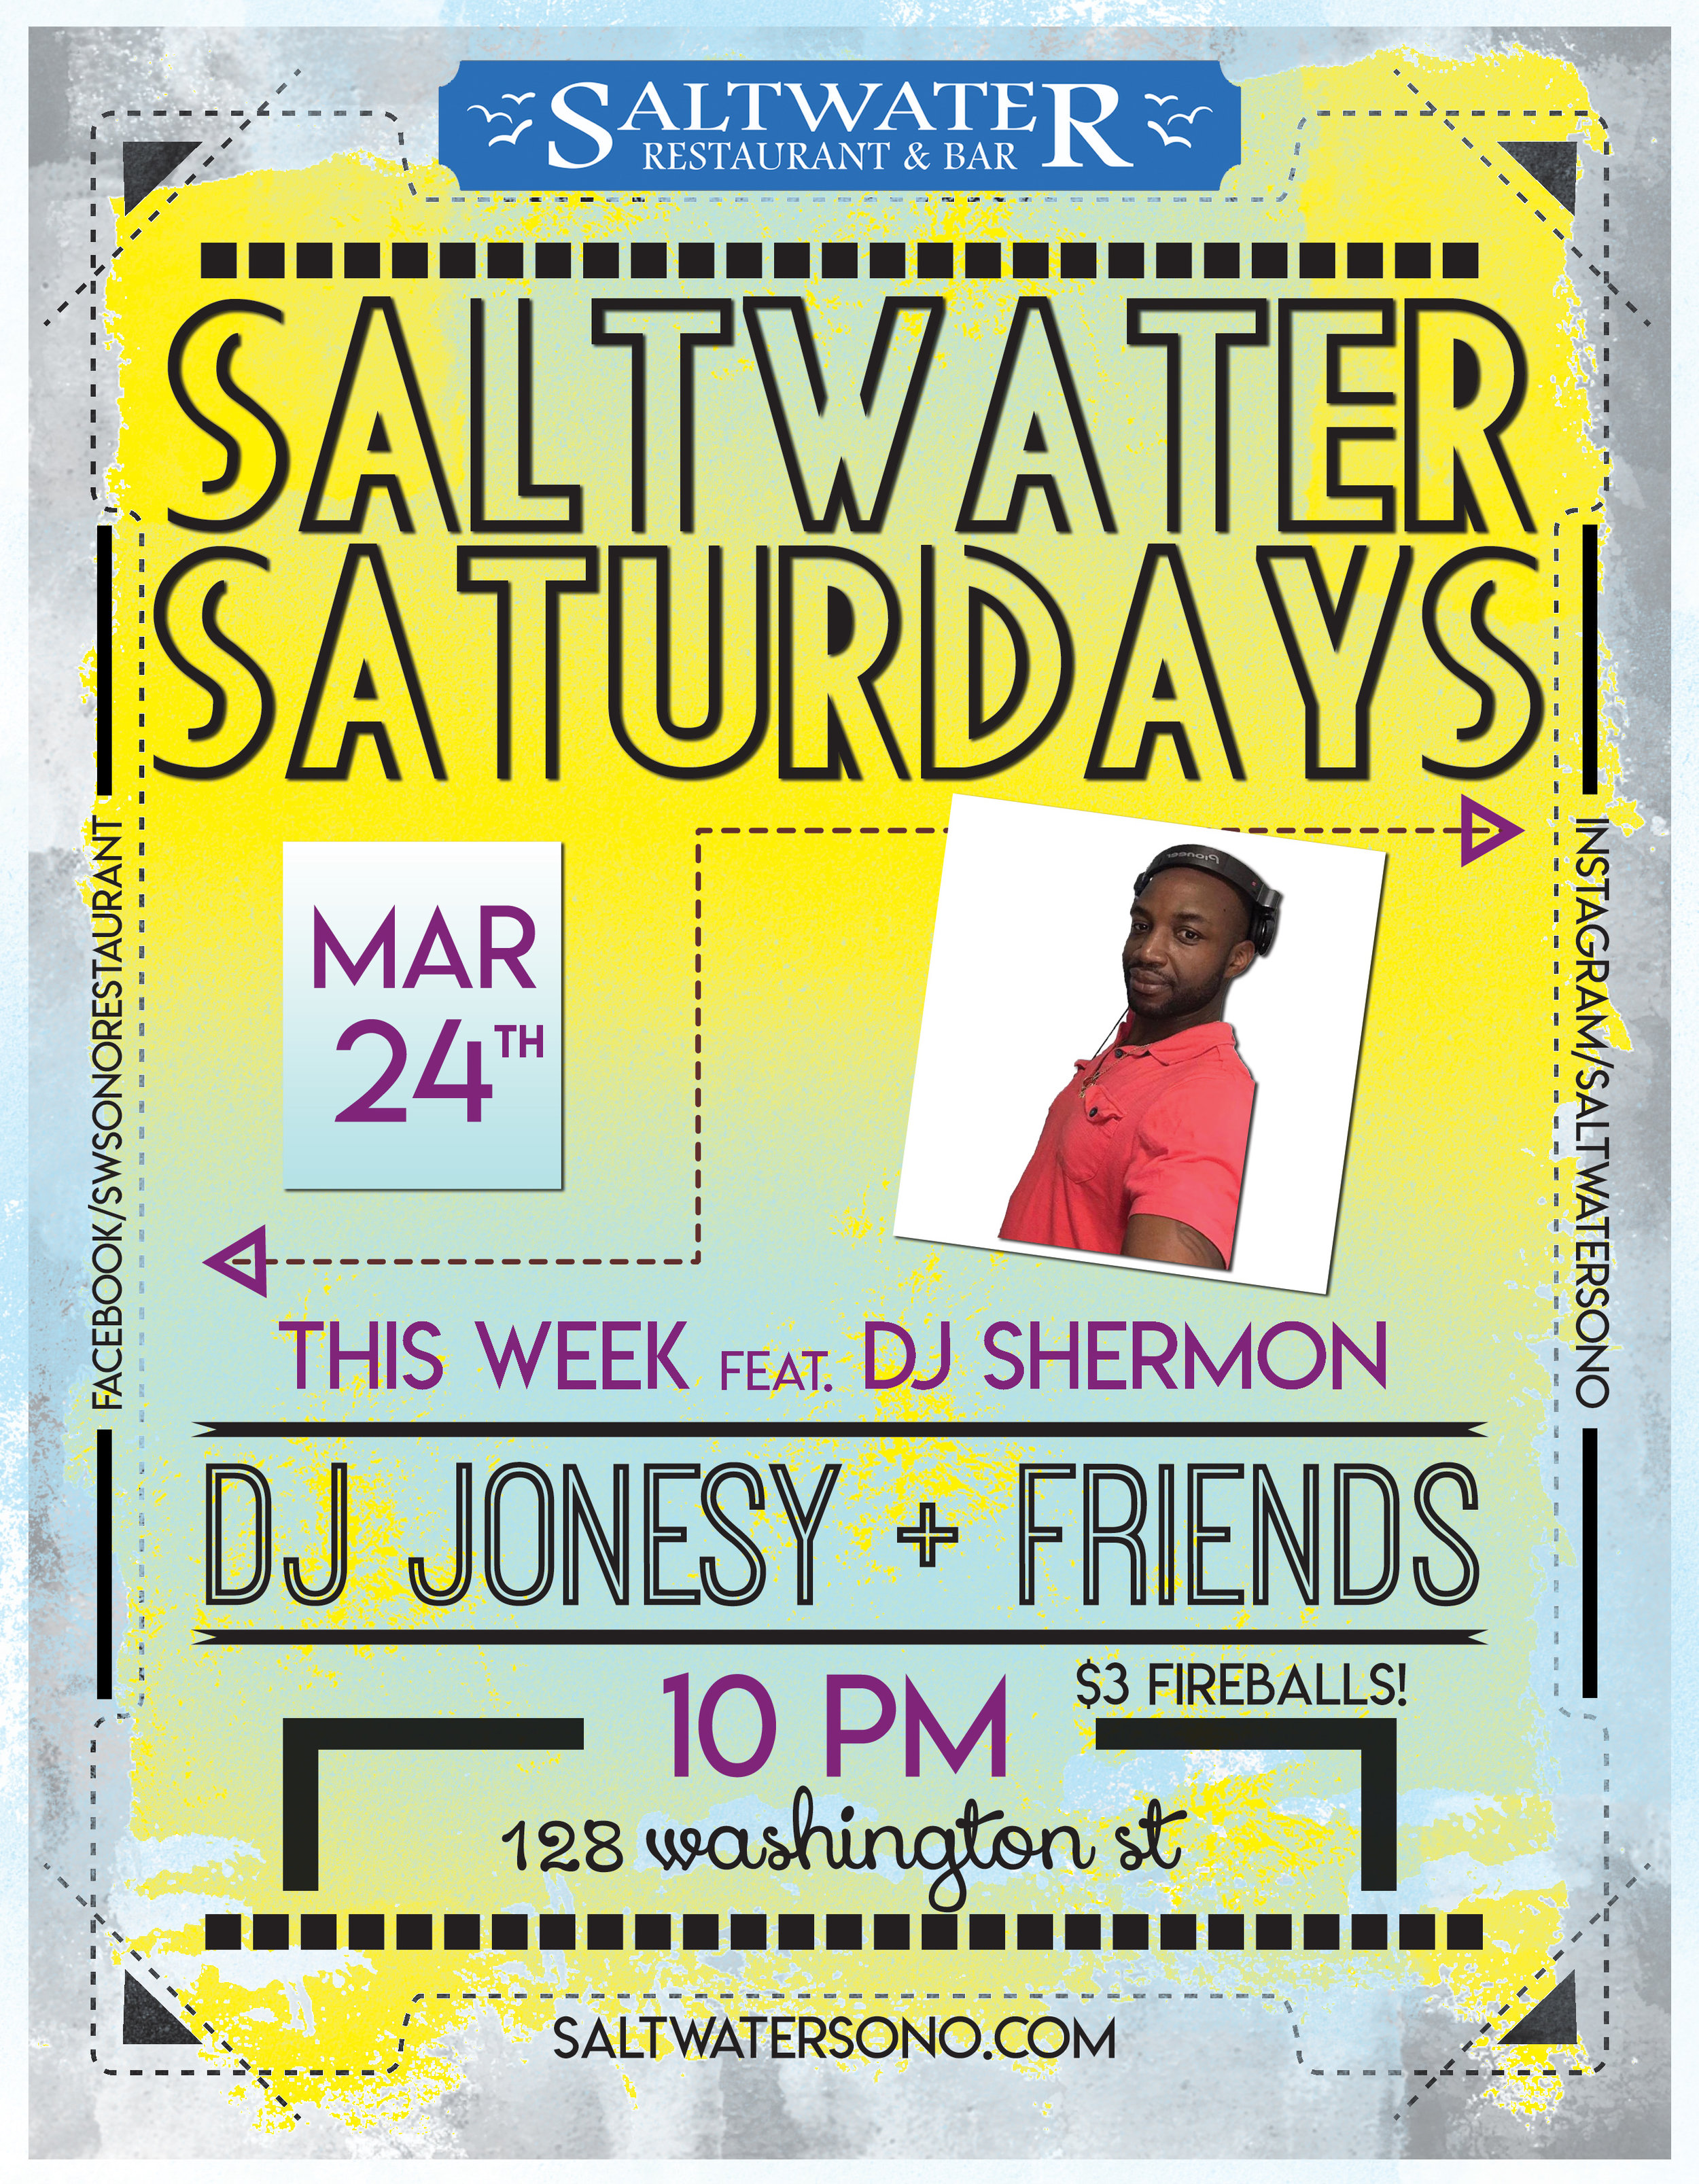 saltwater-saturdays-3-24.jpg